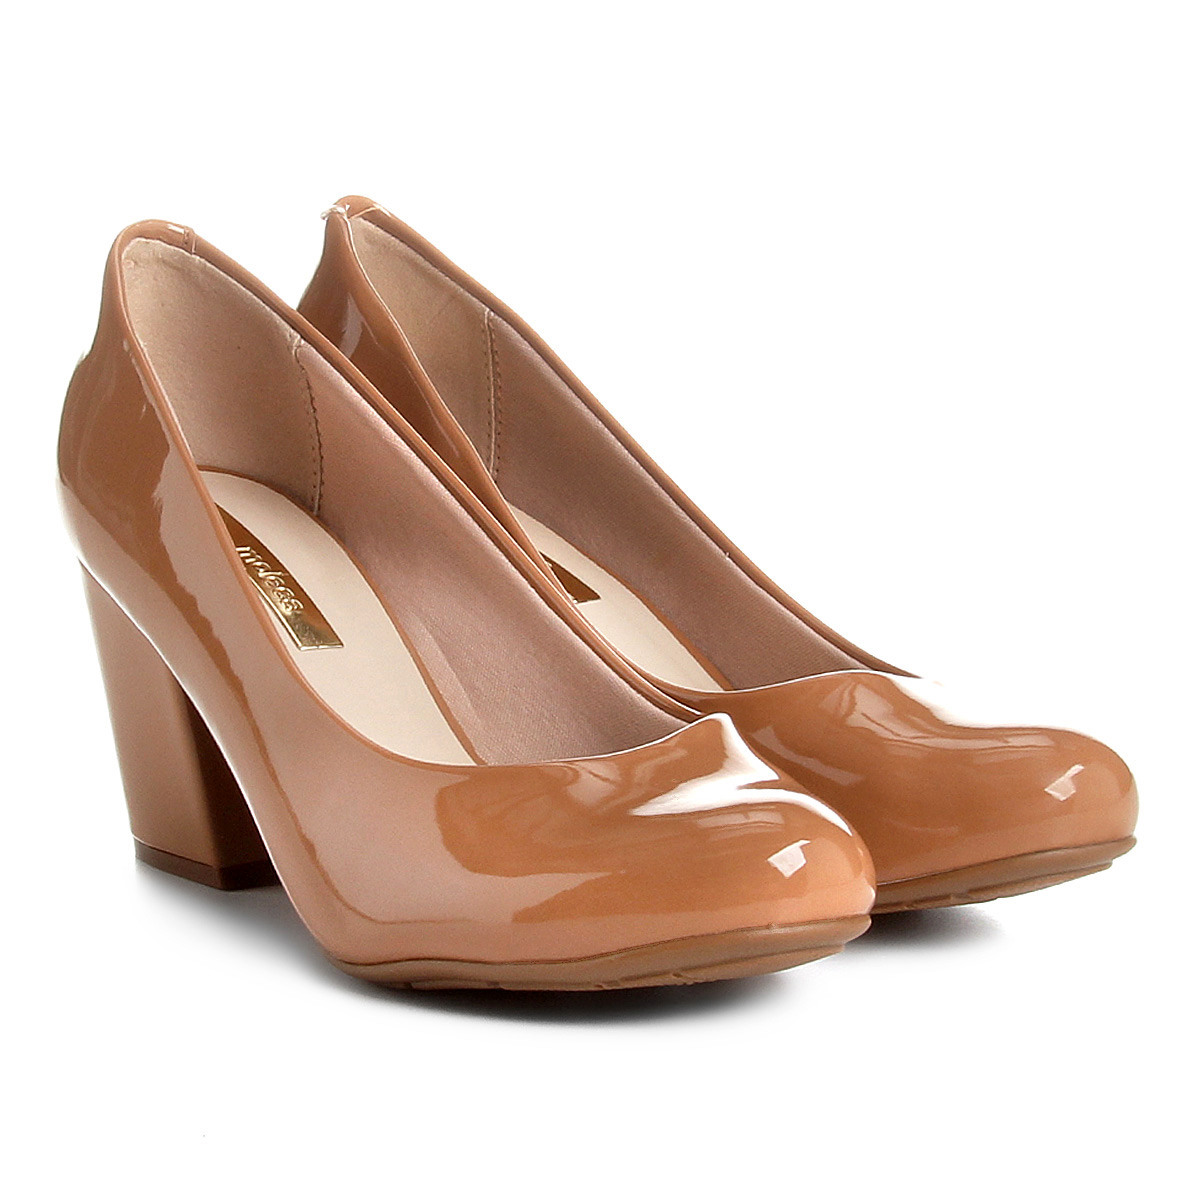 61114ebdd2 Sapato Moleca Boneca Verniz Feminino Nude - Compre Agora